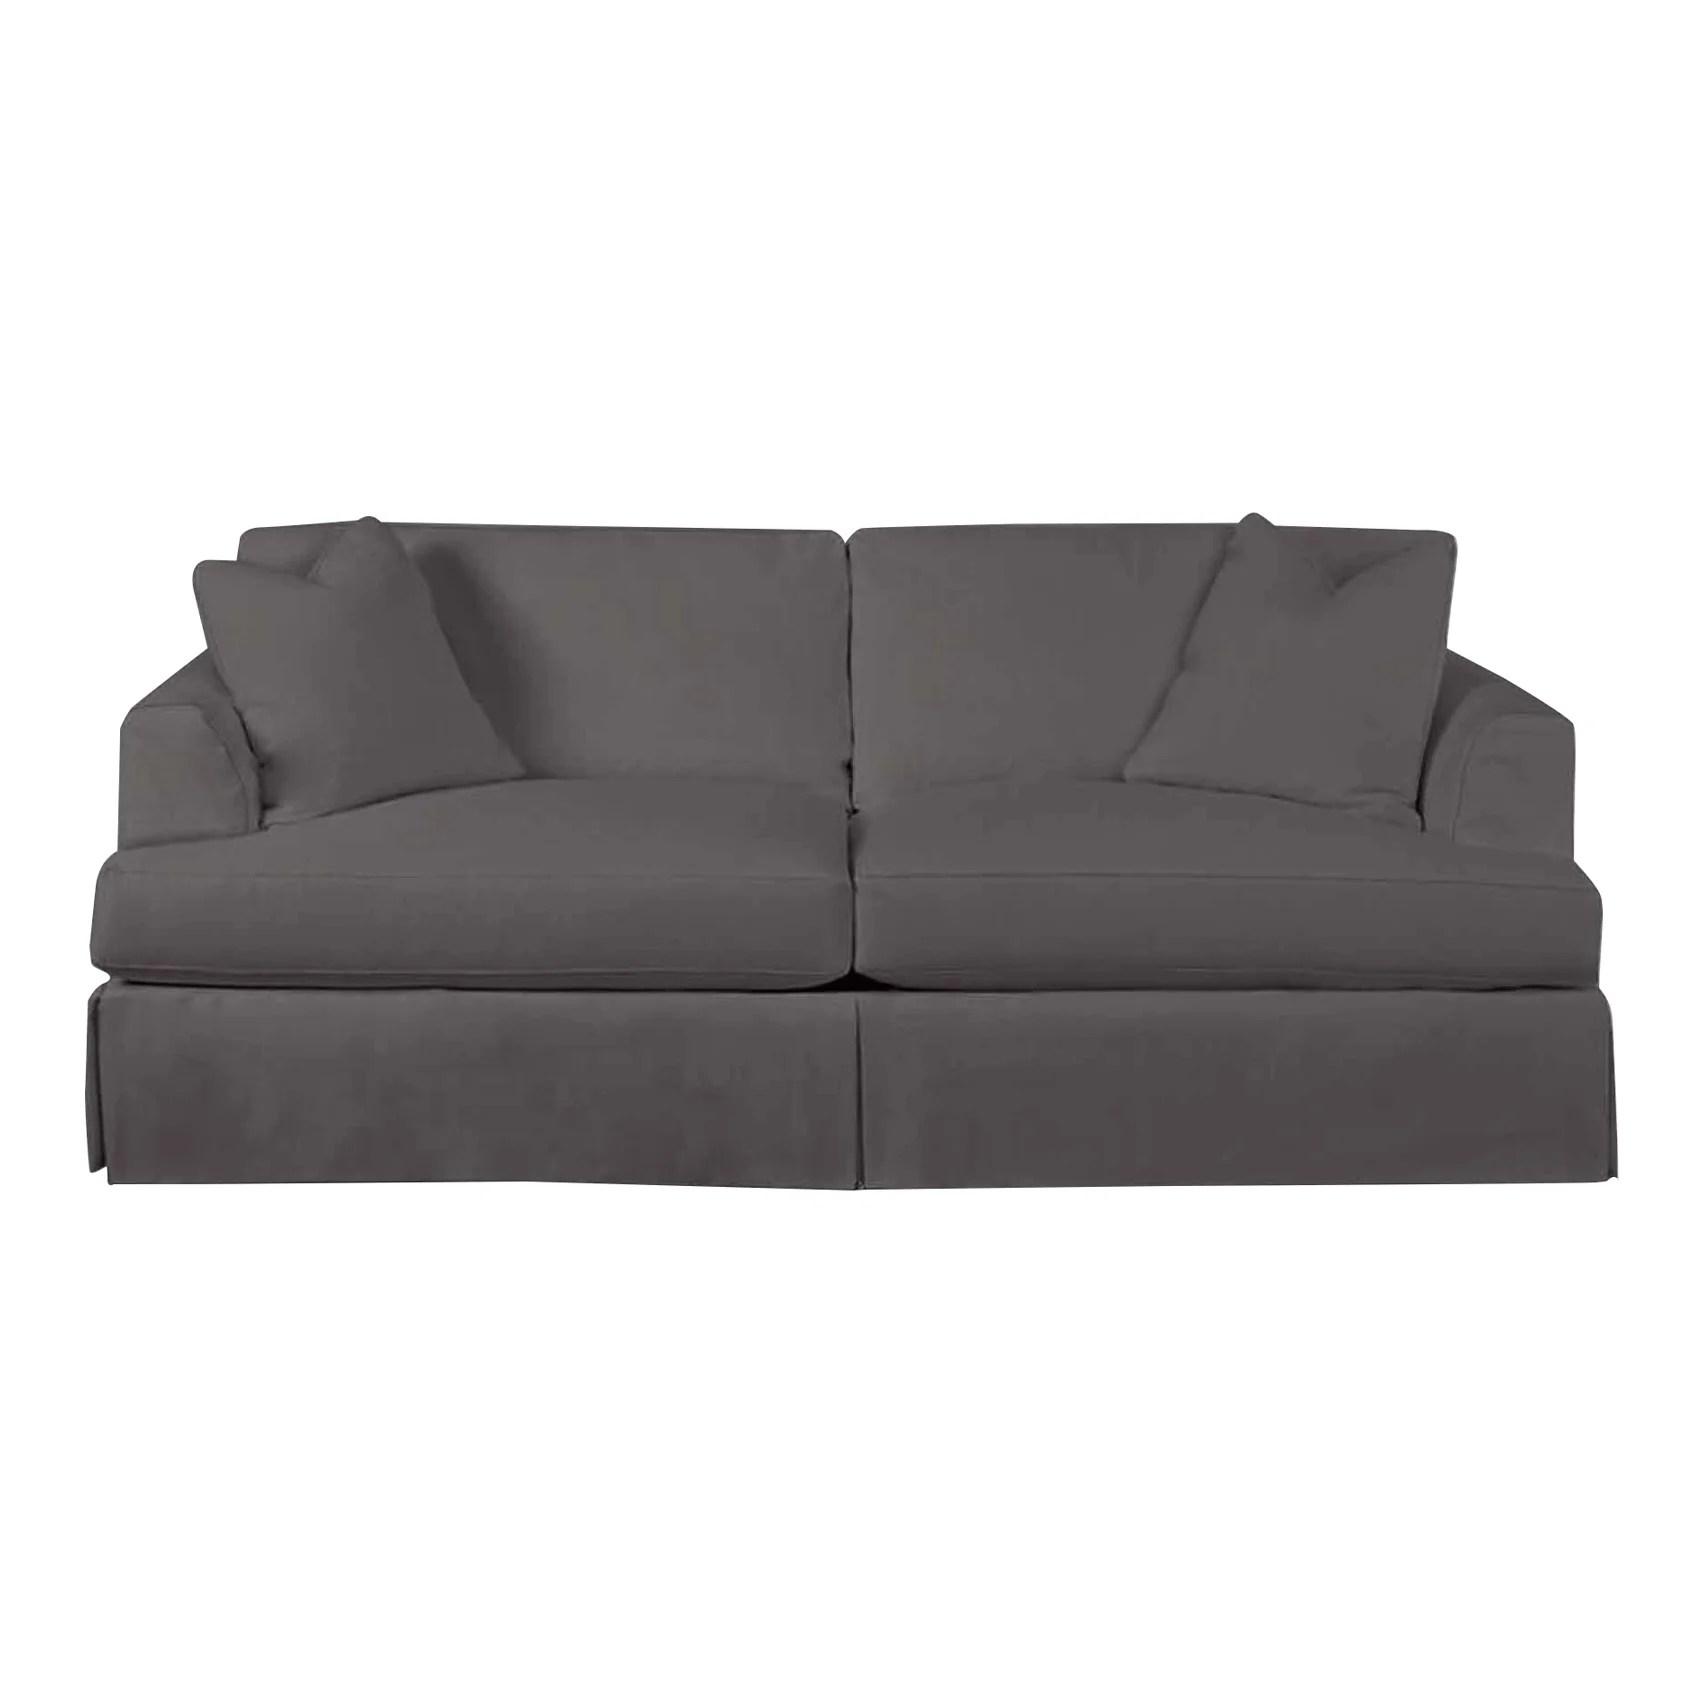 wayfair sofa reviews over floor lamps custom upholstery carly and ca